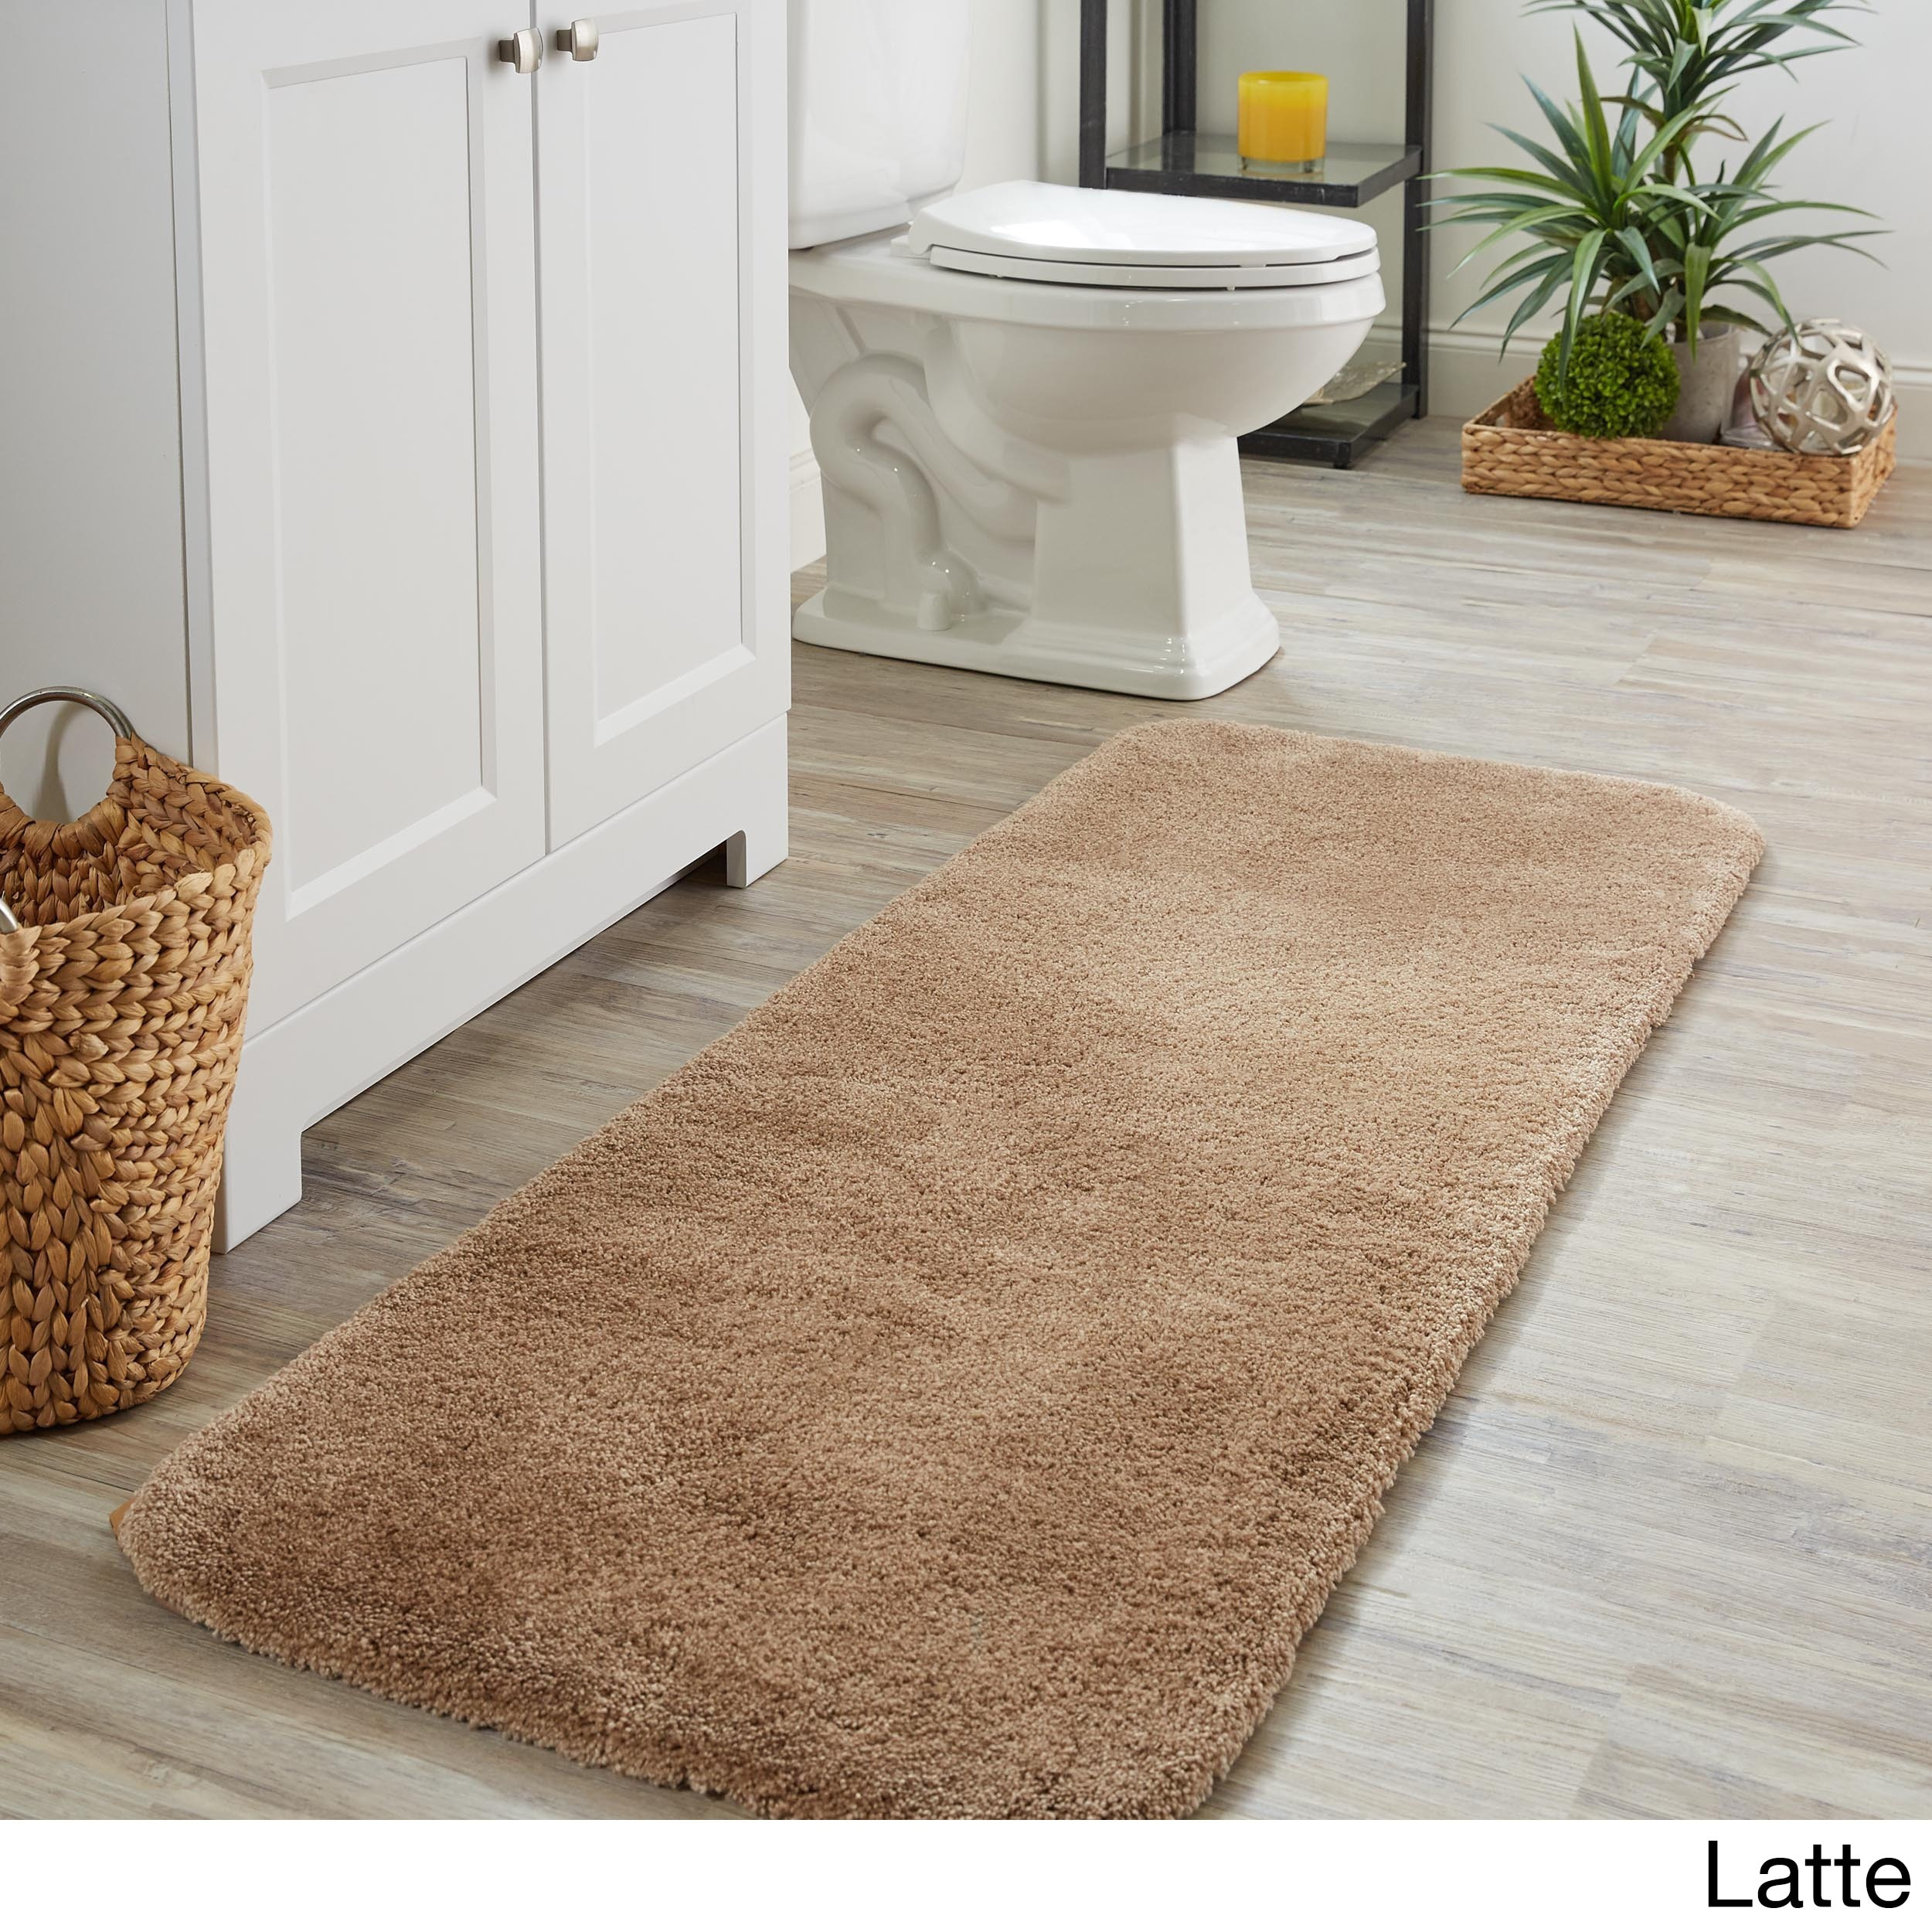 mats mat diy bathroom planning b warehouse d projects wooden bunnings i y floor advice shower nz